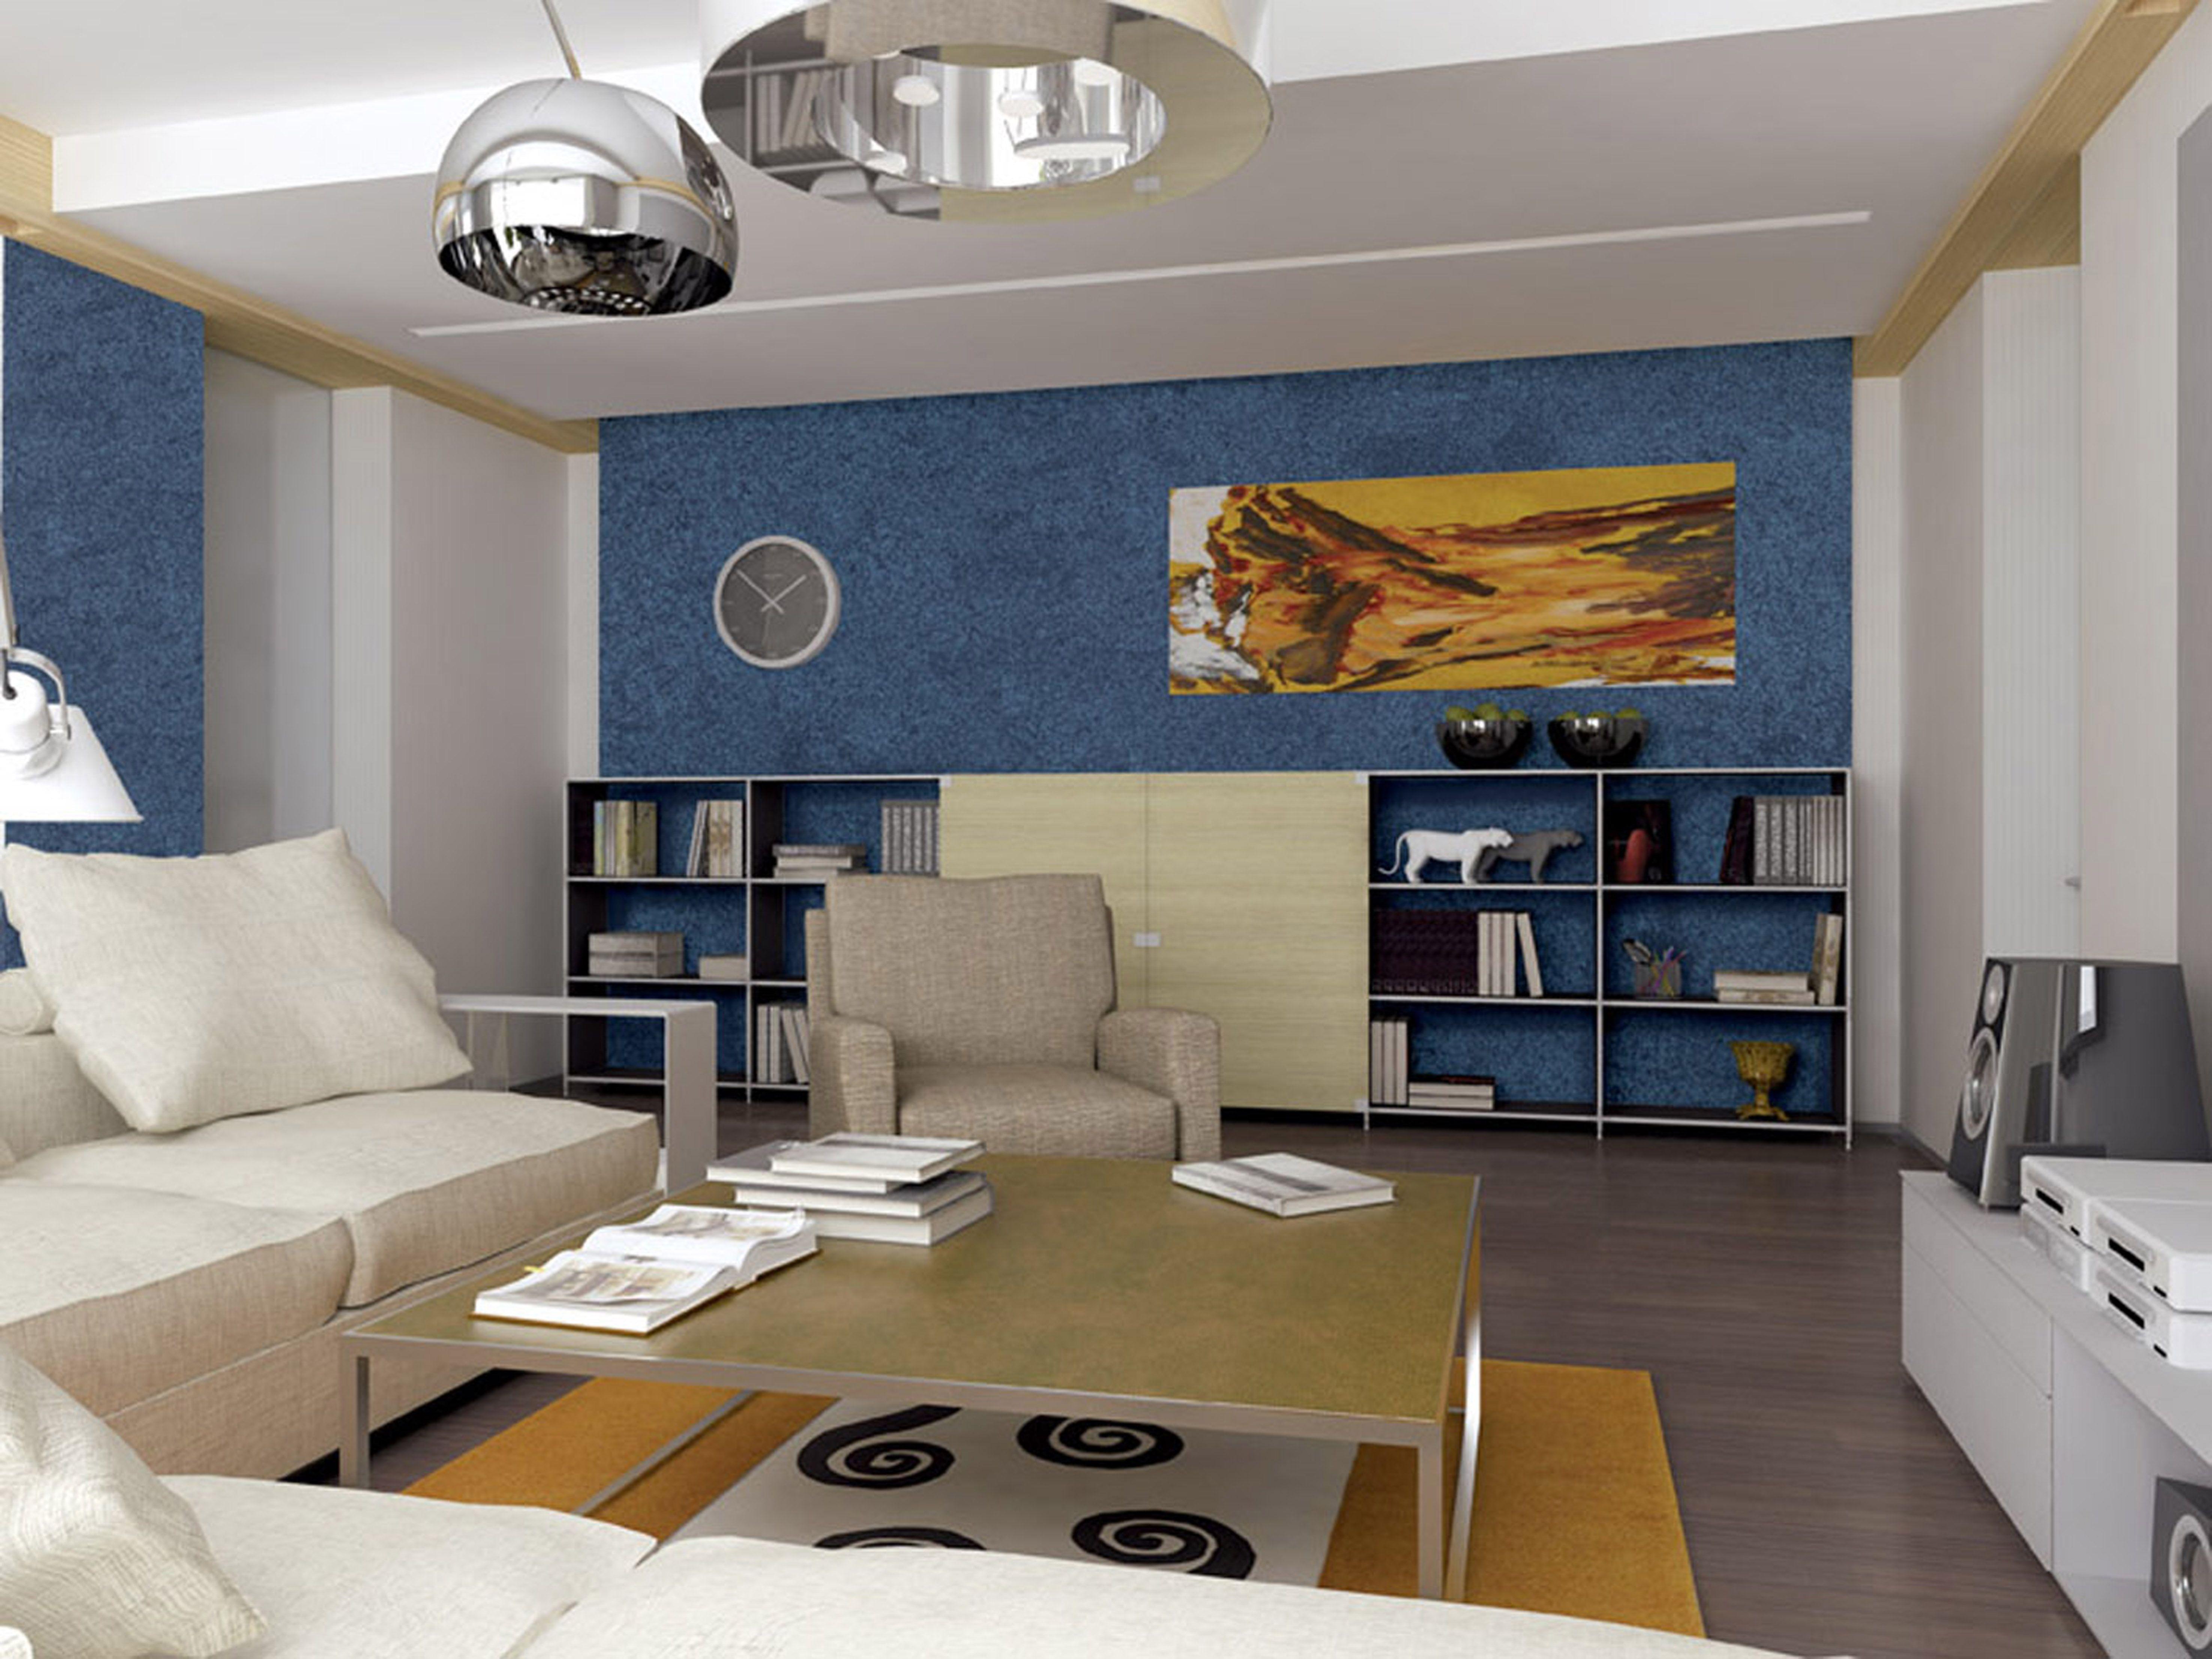 Decoracion contemporaneo sala de estar dibujos for Sala de estar dibujo